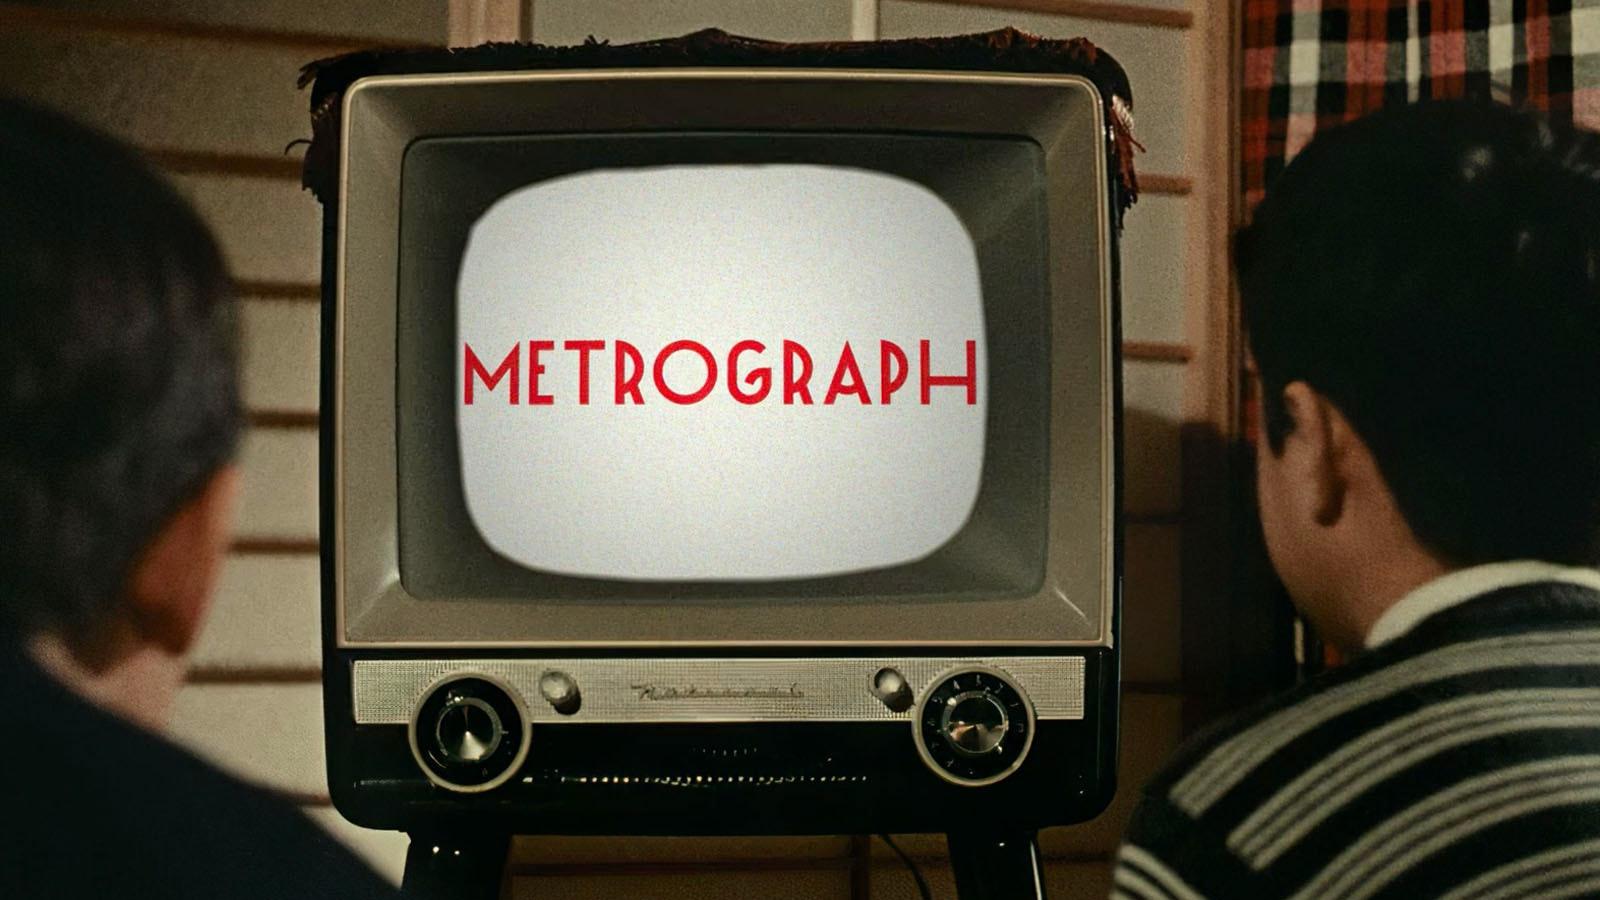 Metrograph TV App cropped